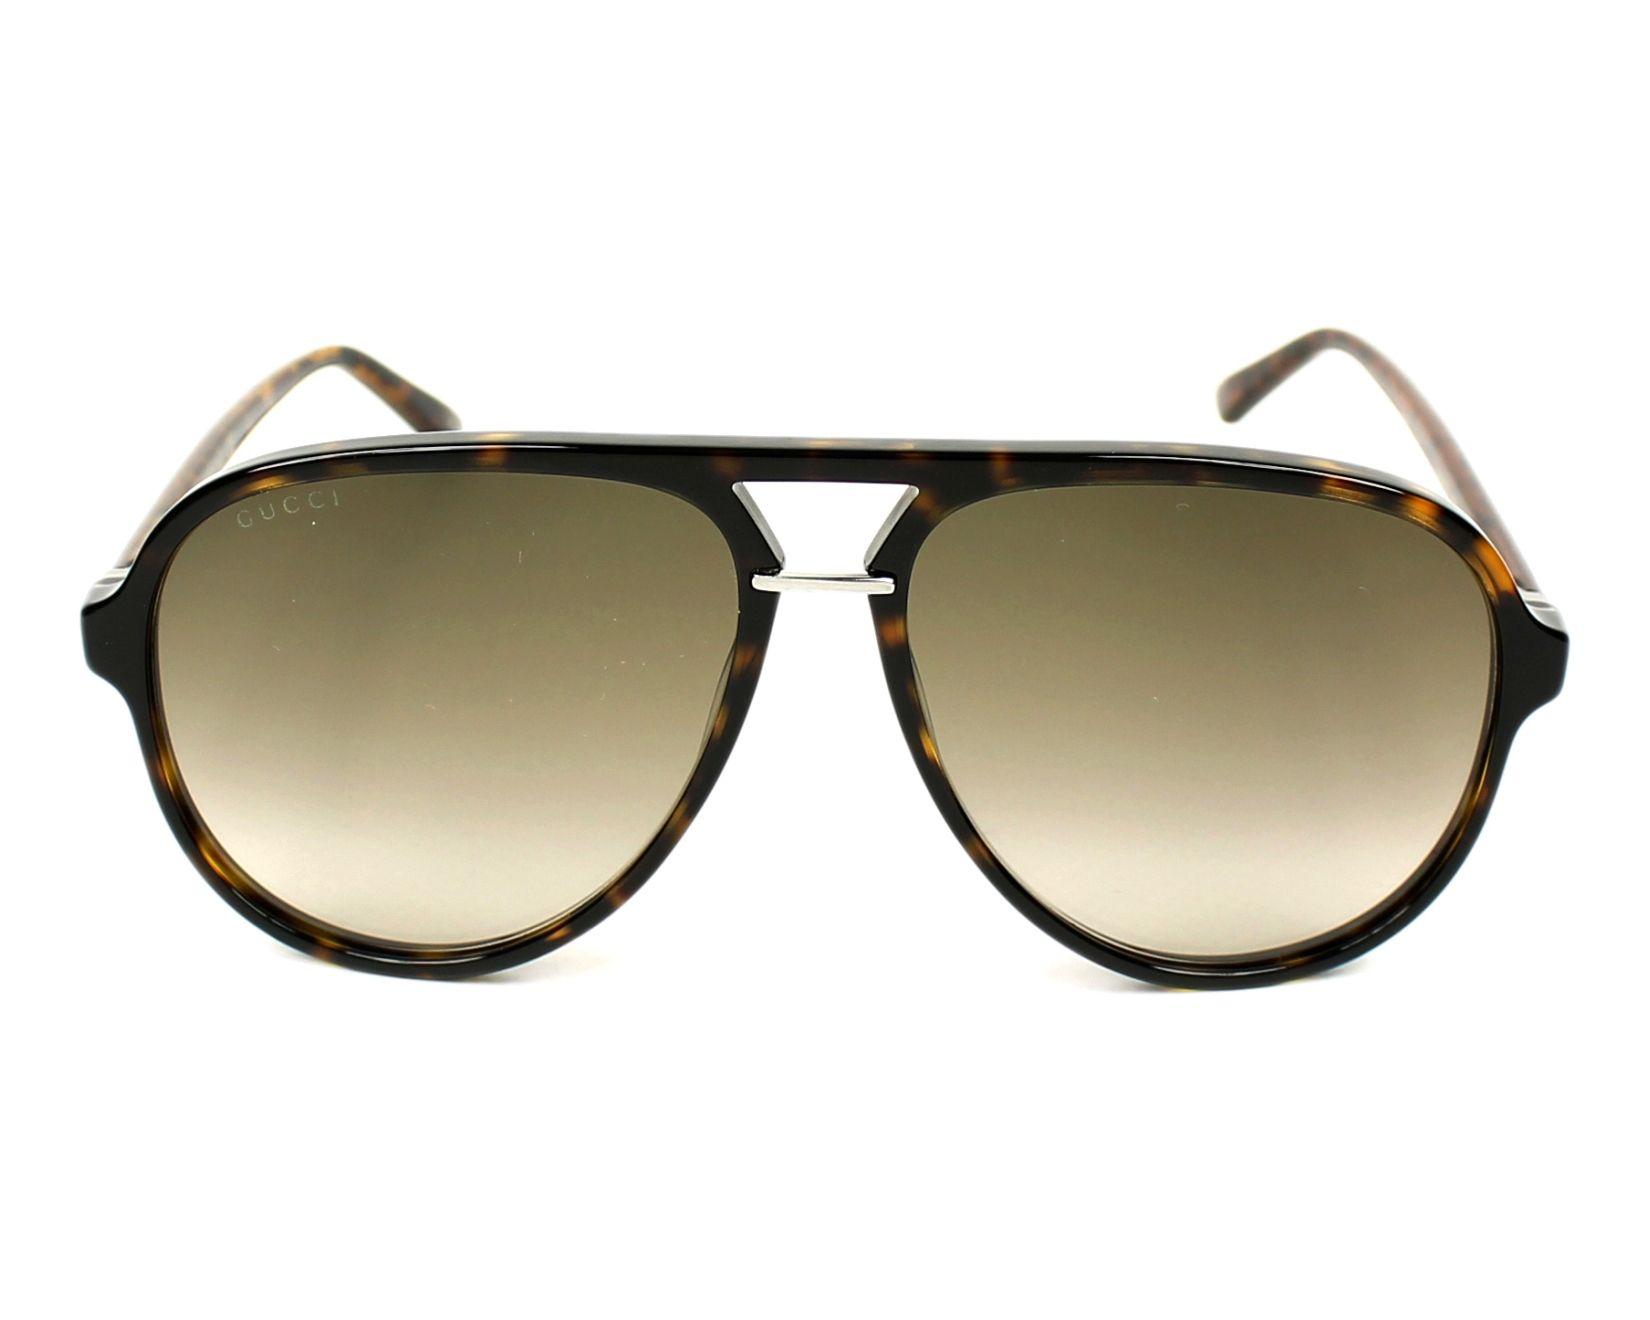 47a3a17f4c7 Sunglasses Gucci GG-0015-S 002 58-14 Havana front view